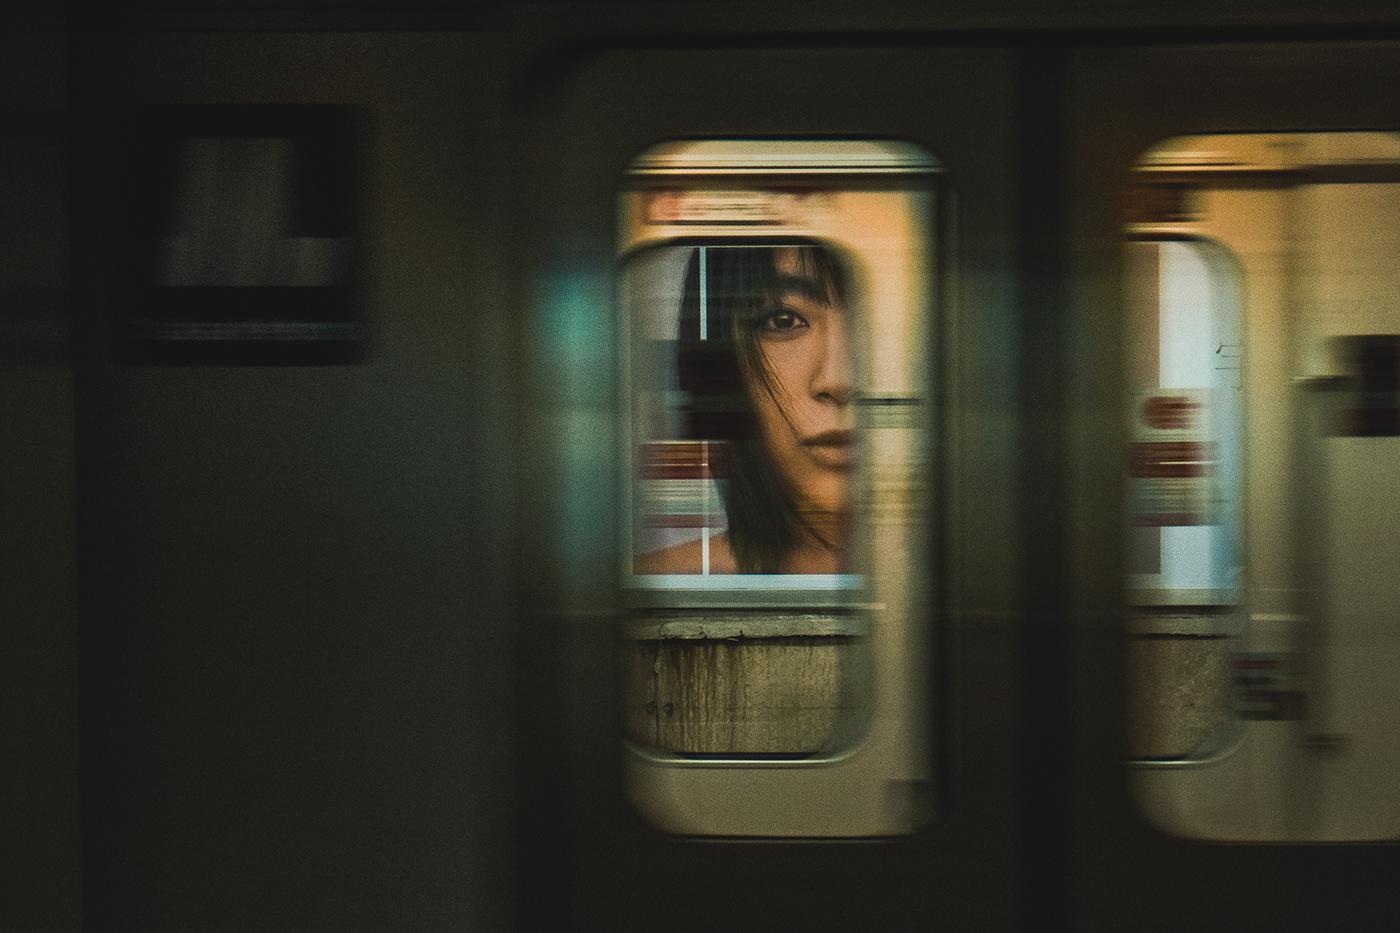 cinematic,city,darkness,japan,osaka,people,streetphotography,subway,Travel,Urban